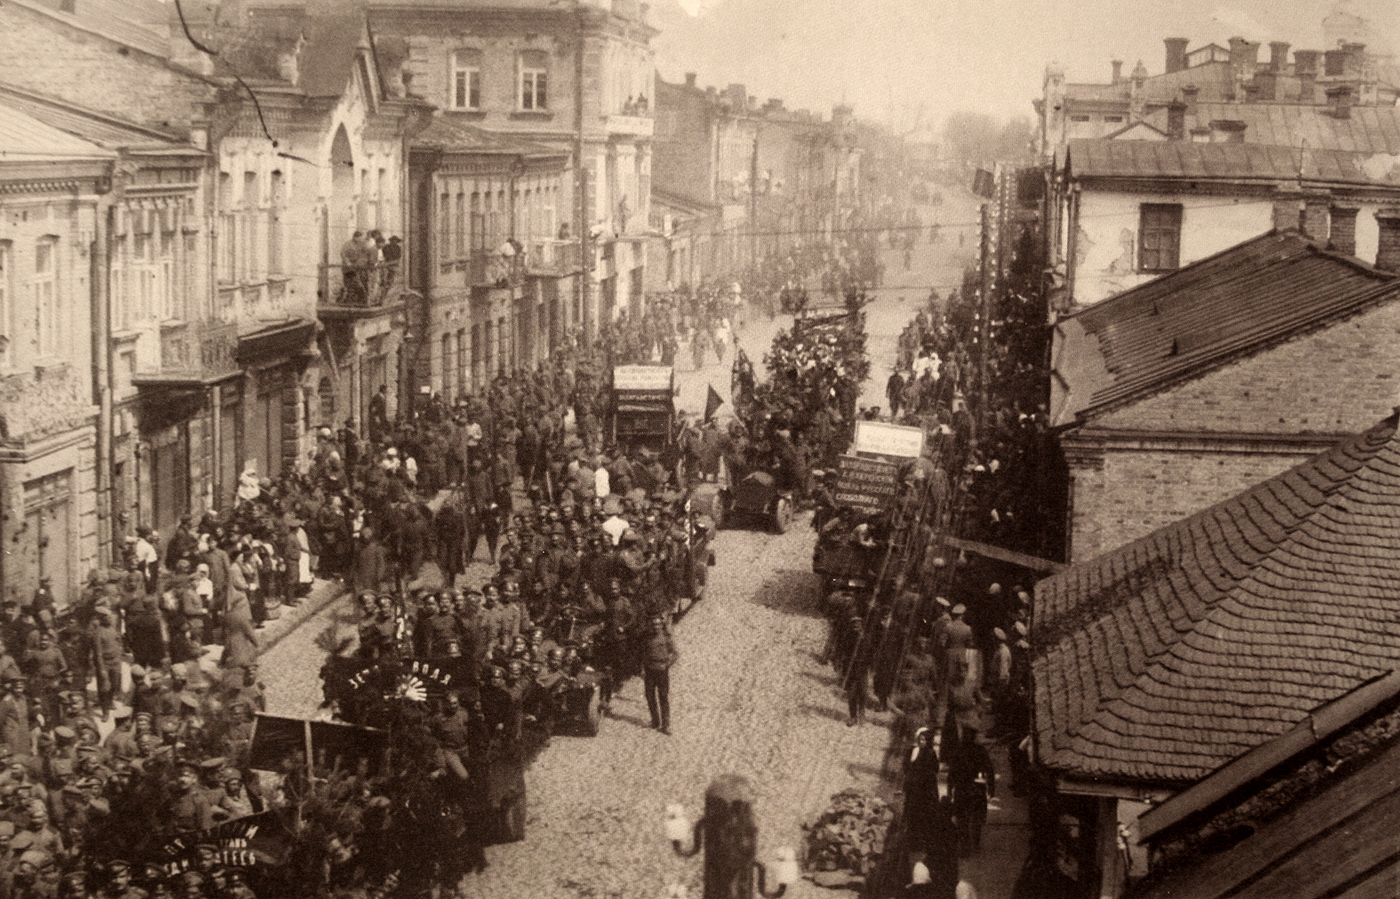 Луцьк у 1917. Перше більшовицьке нашестя і калоші гласного